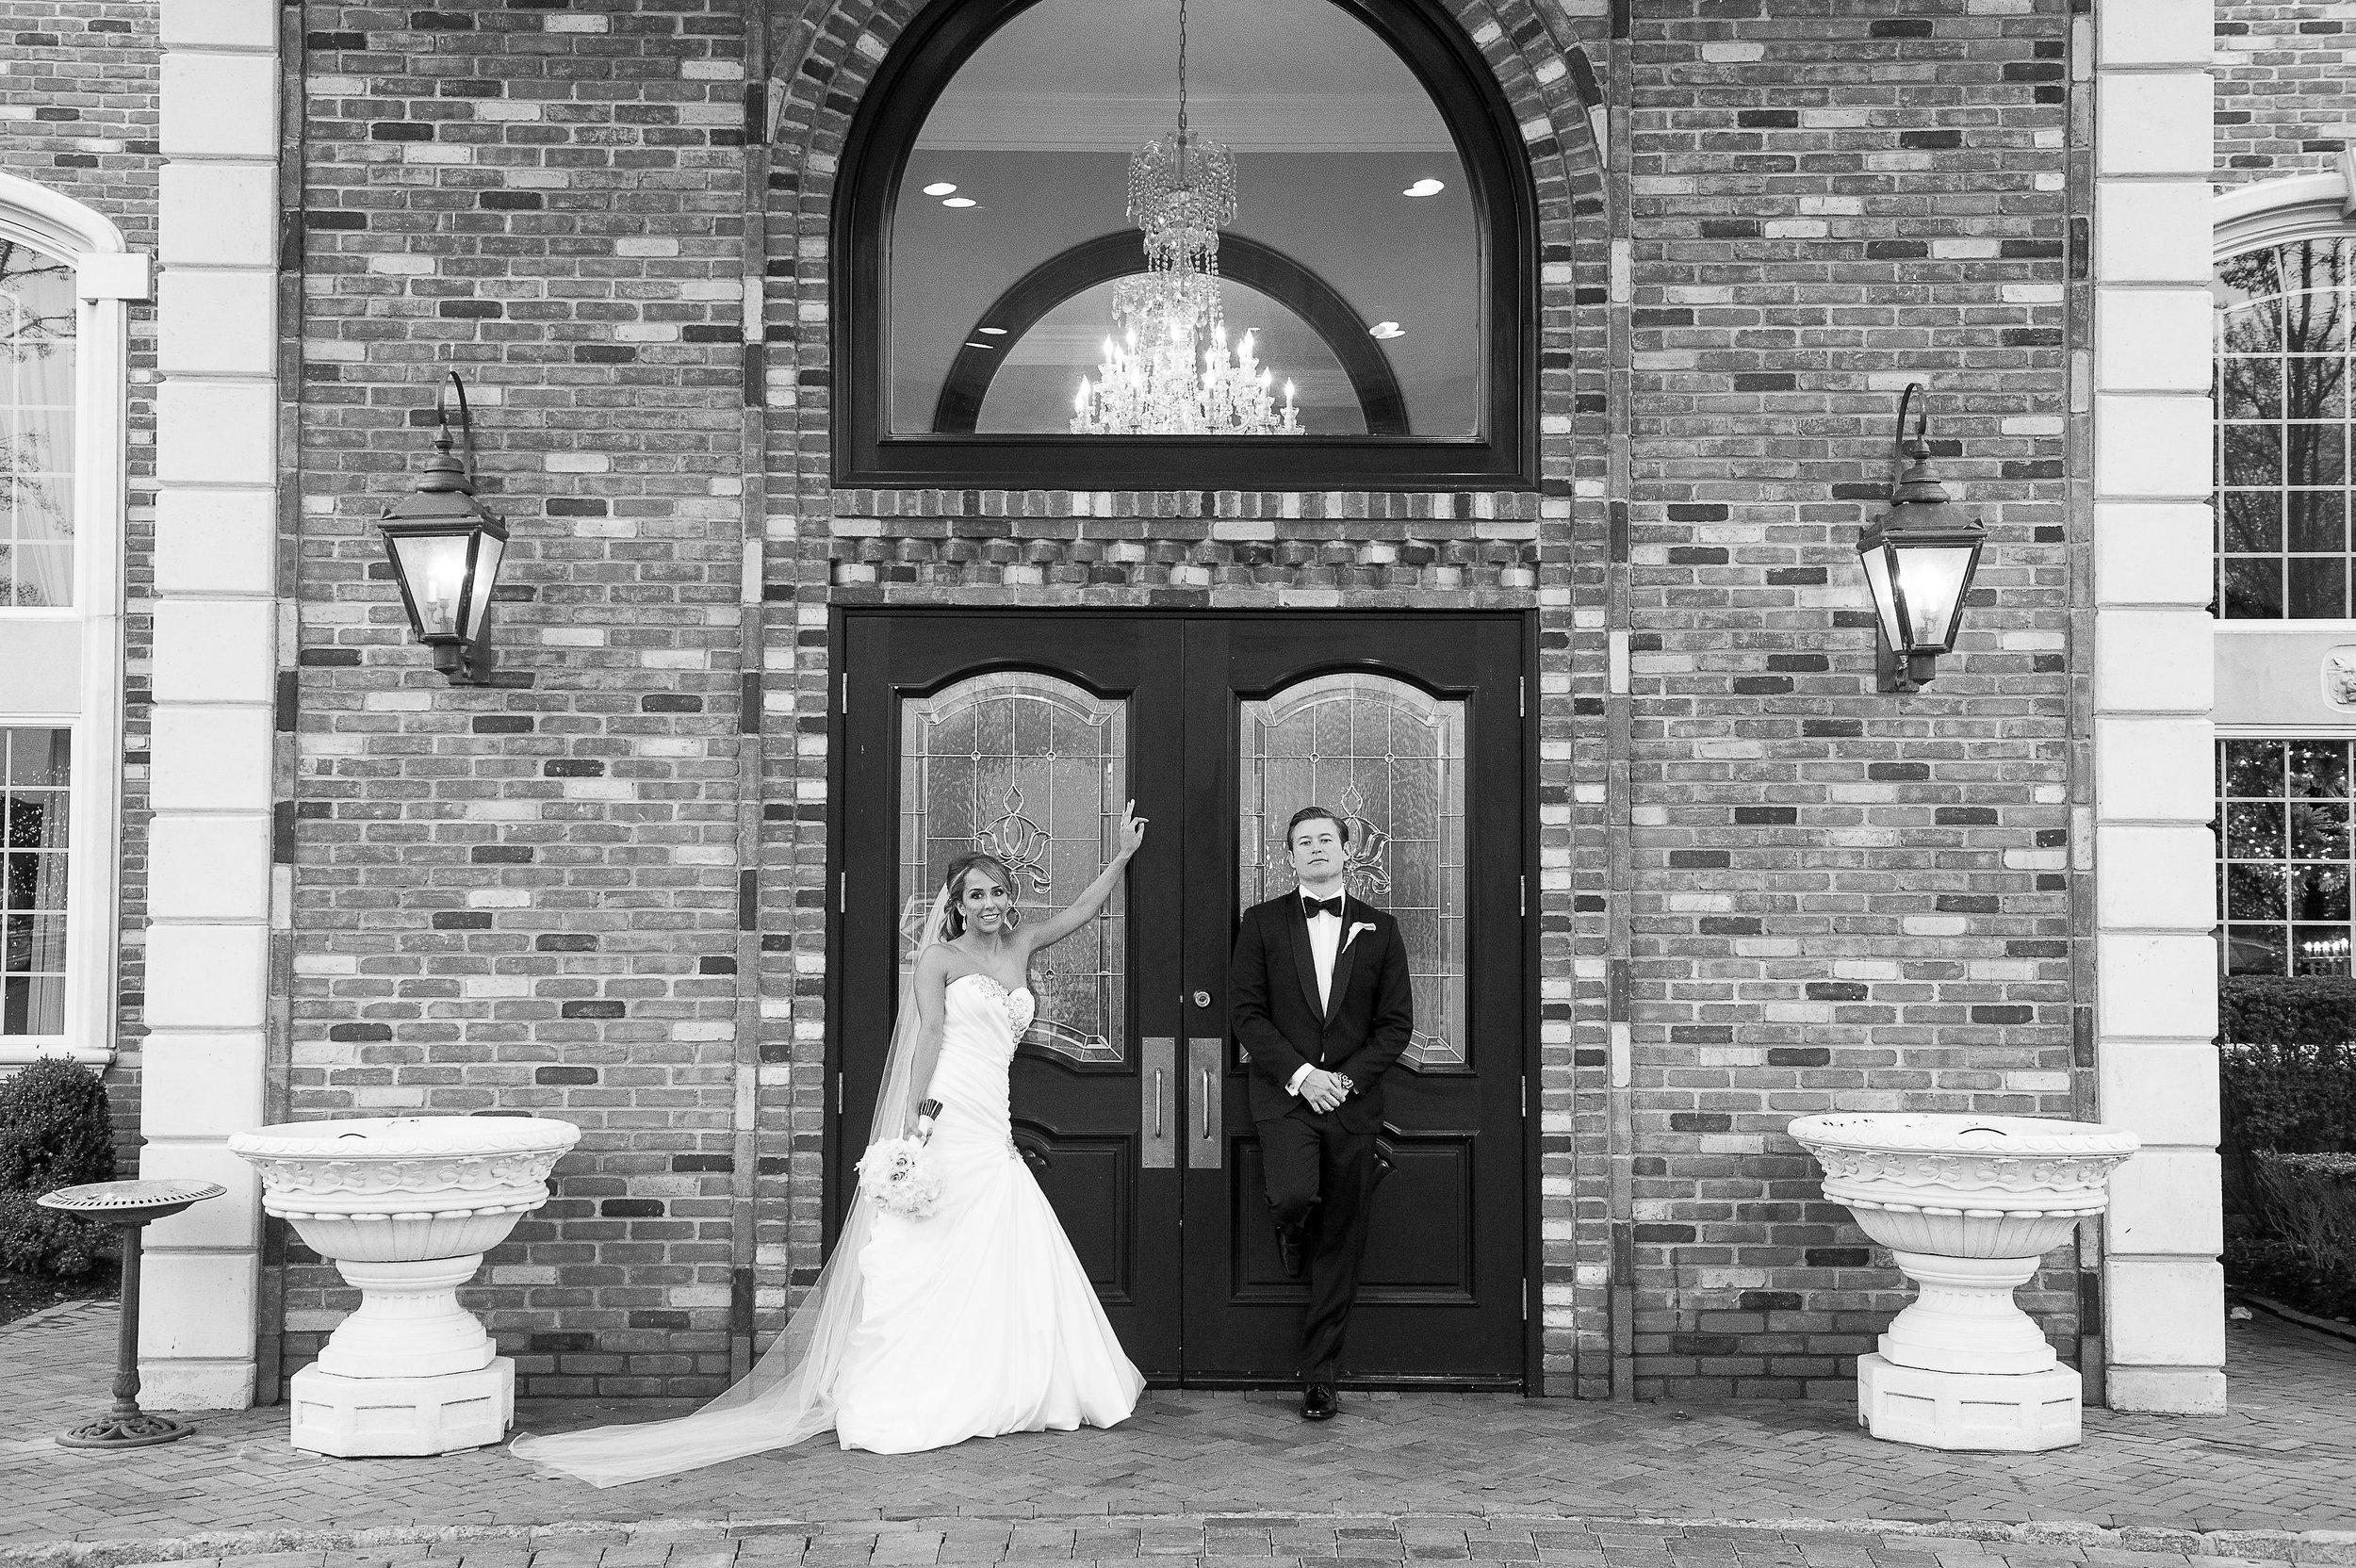 Ceci_New_York_Custom_Invitation_ New_Jersey_Wedding_Luxury_Personalized_Ceci_Style_Bride_Foil_Stamping105.JPG